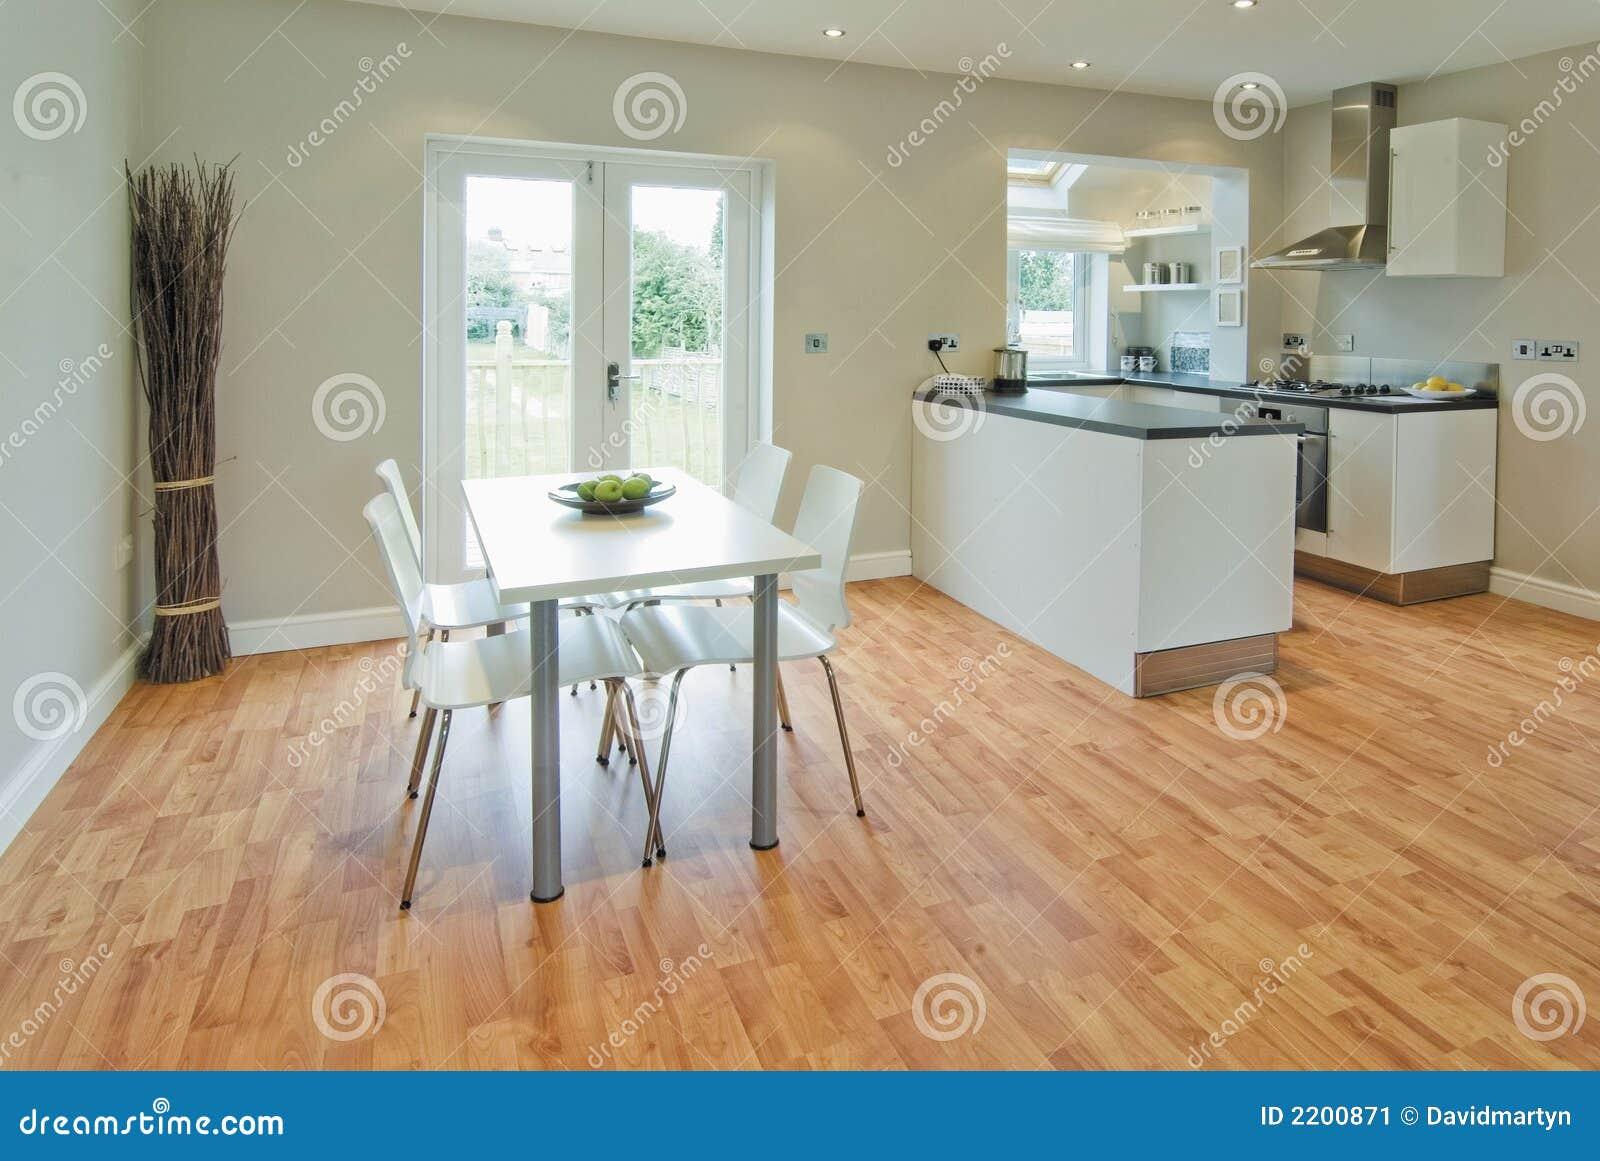 Sala da pranzo e cucina immagine stock. Immagine di agente - 2200871